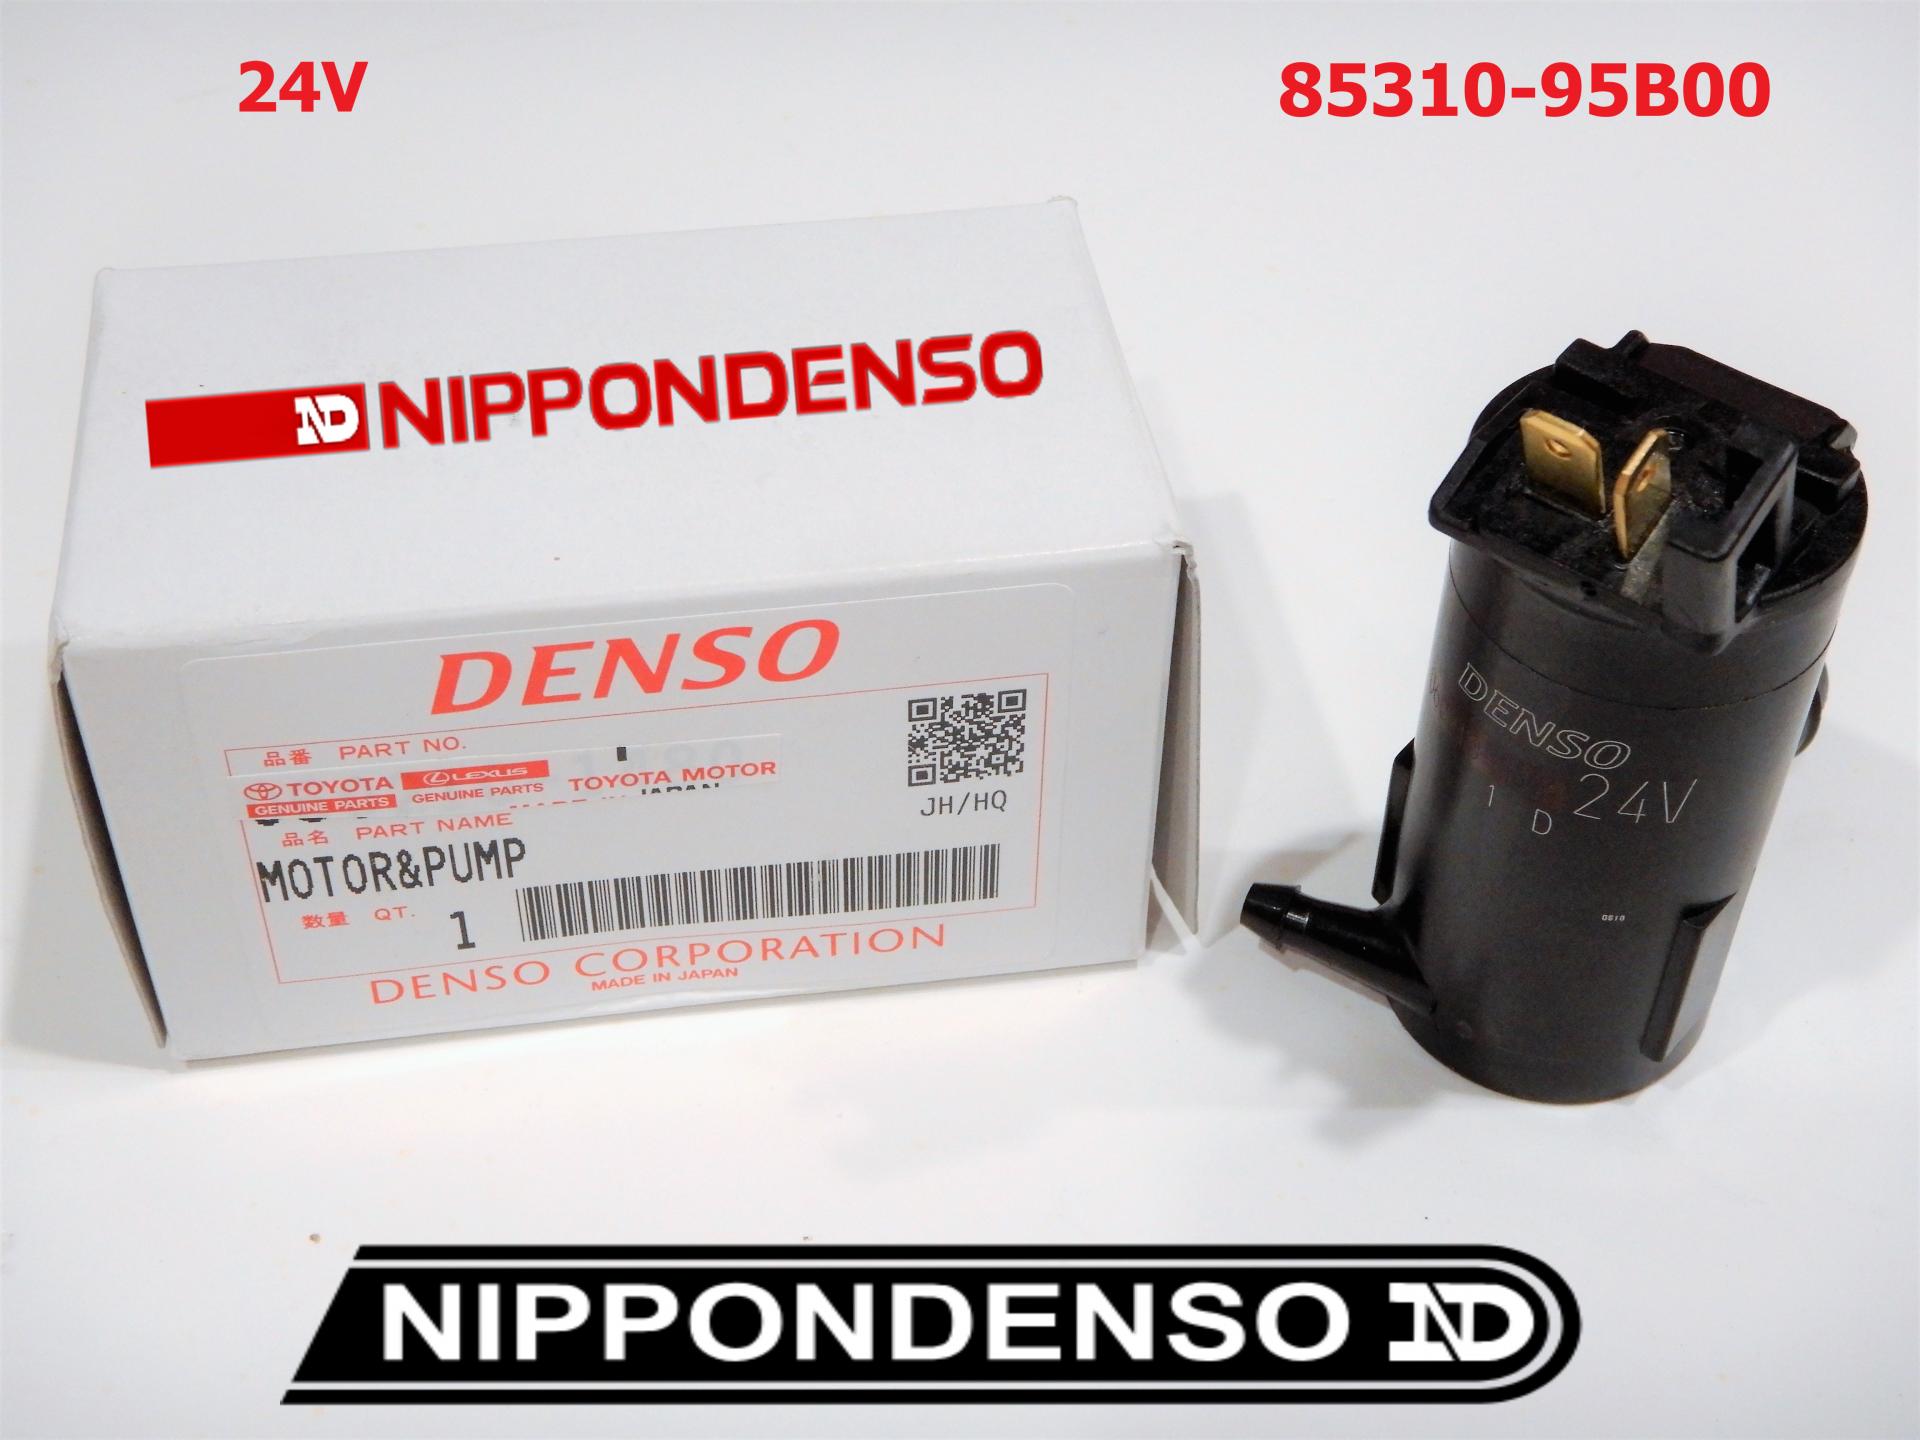 DSCN8375 - Copy.png